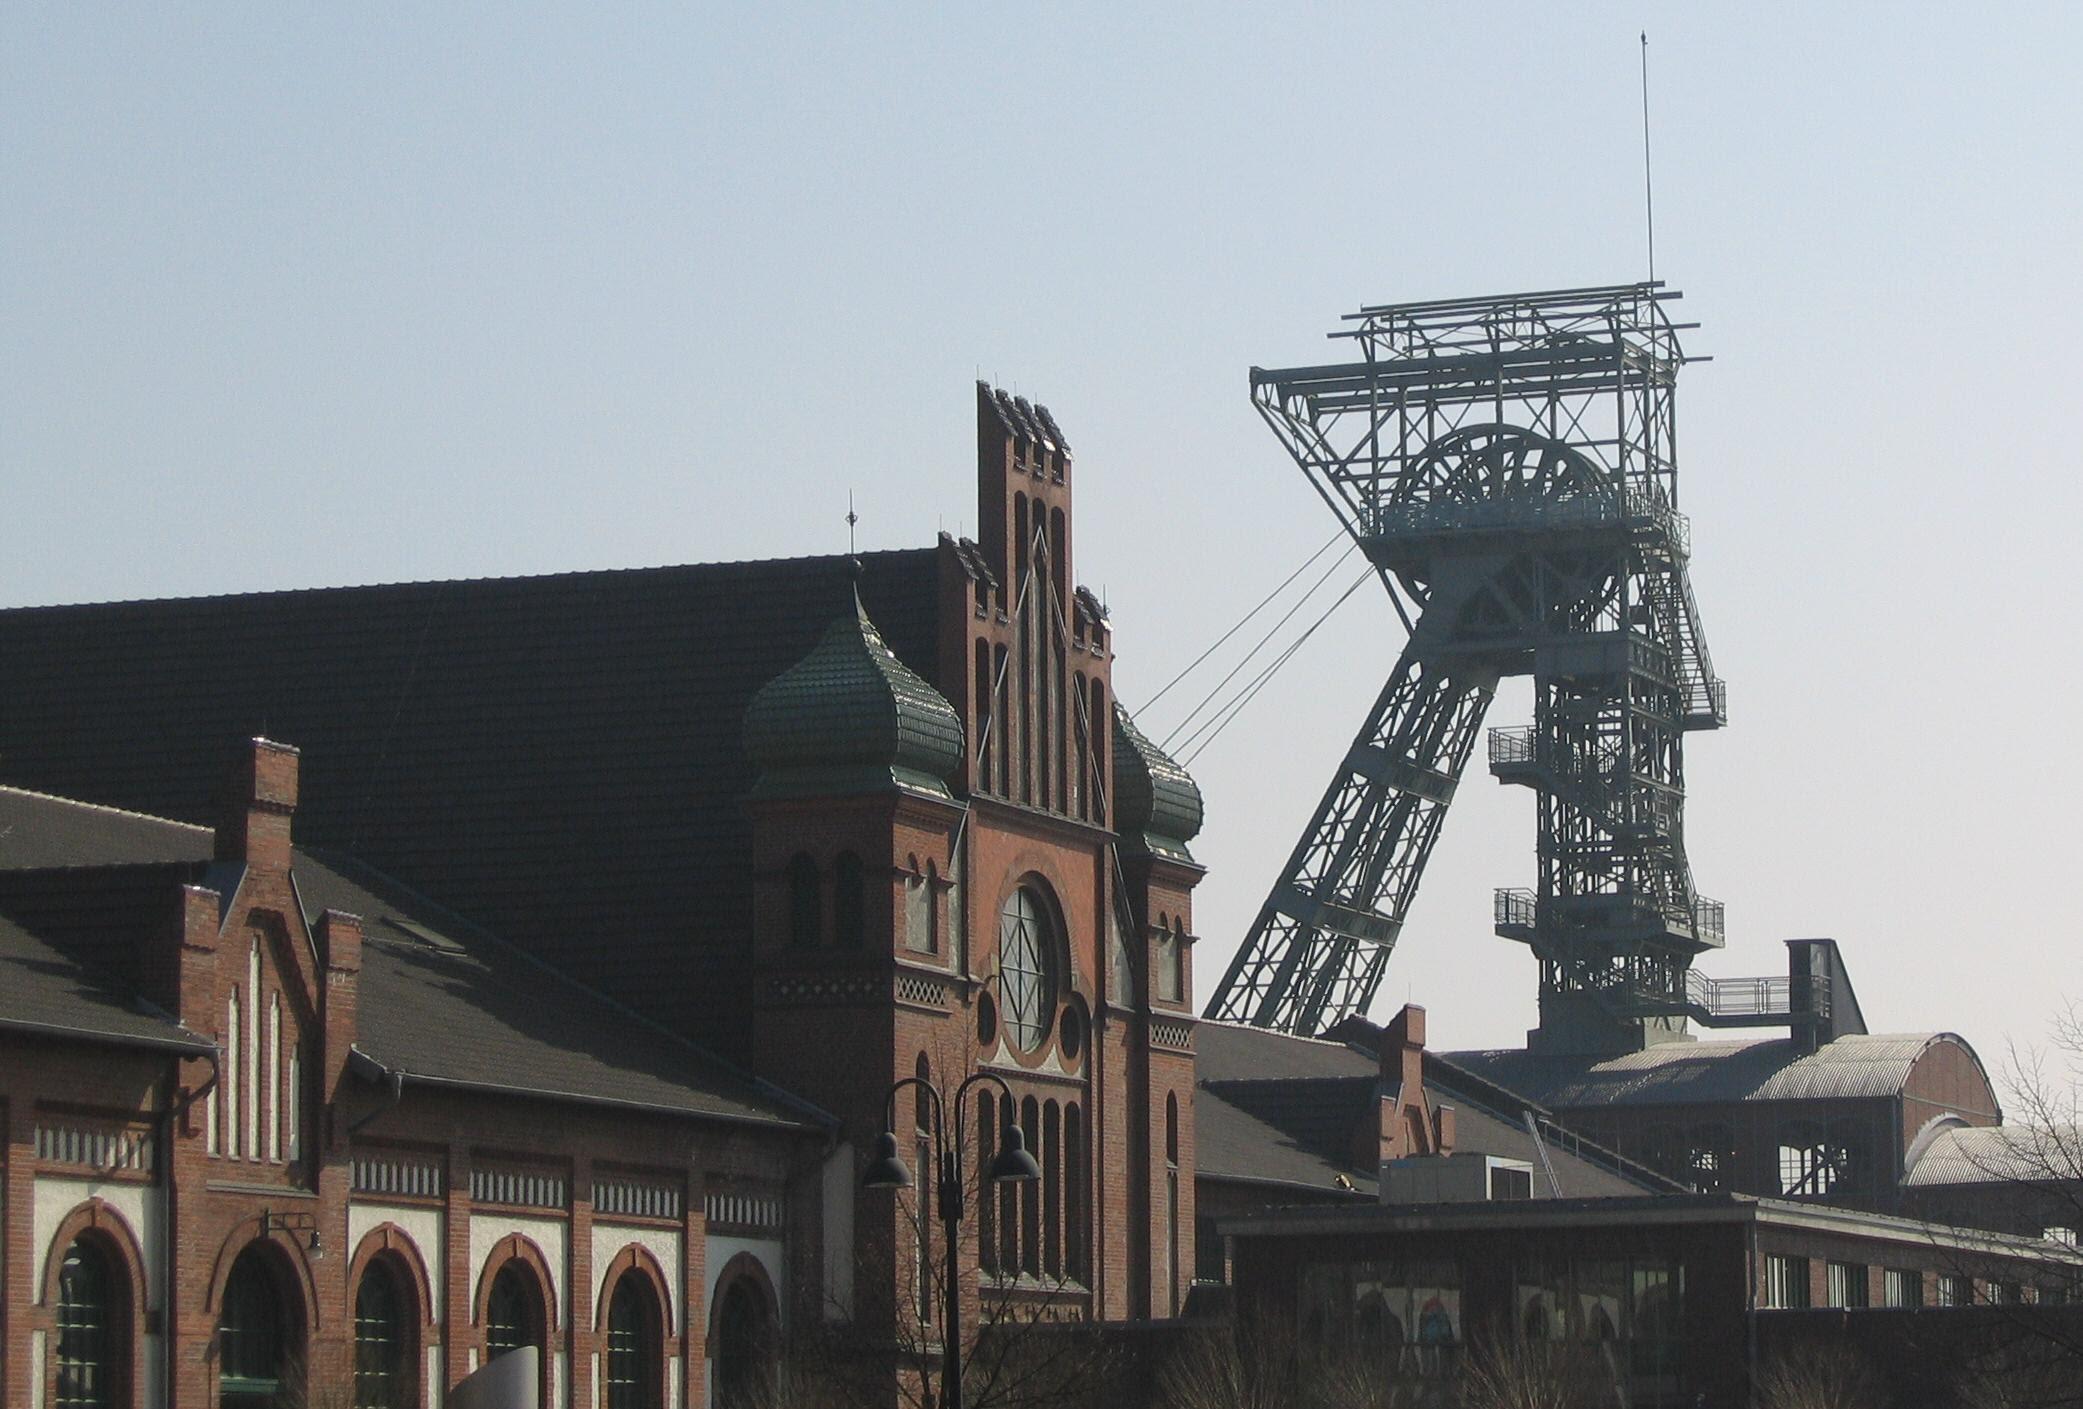 Zeche-zollern-2004.jpg